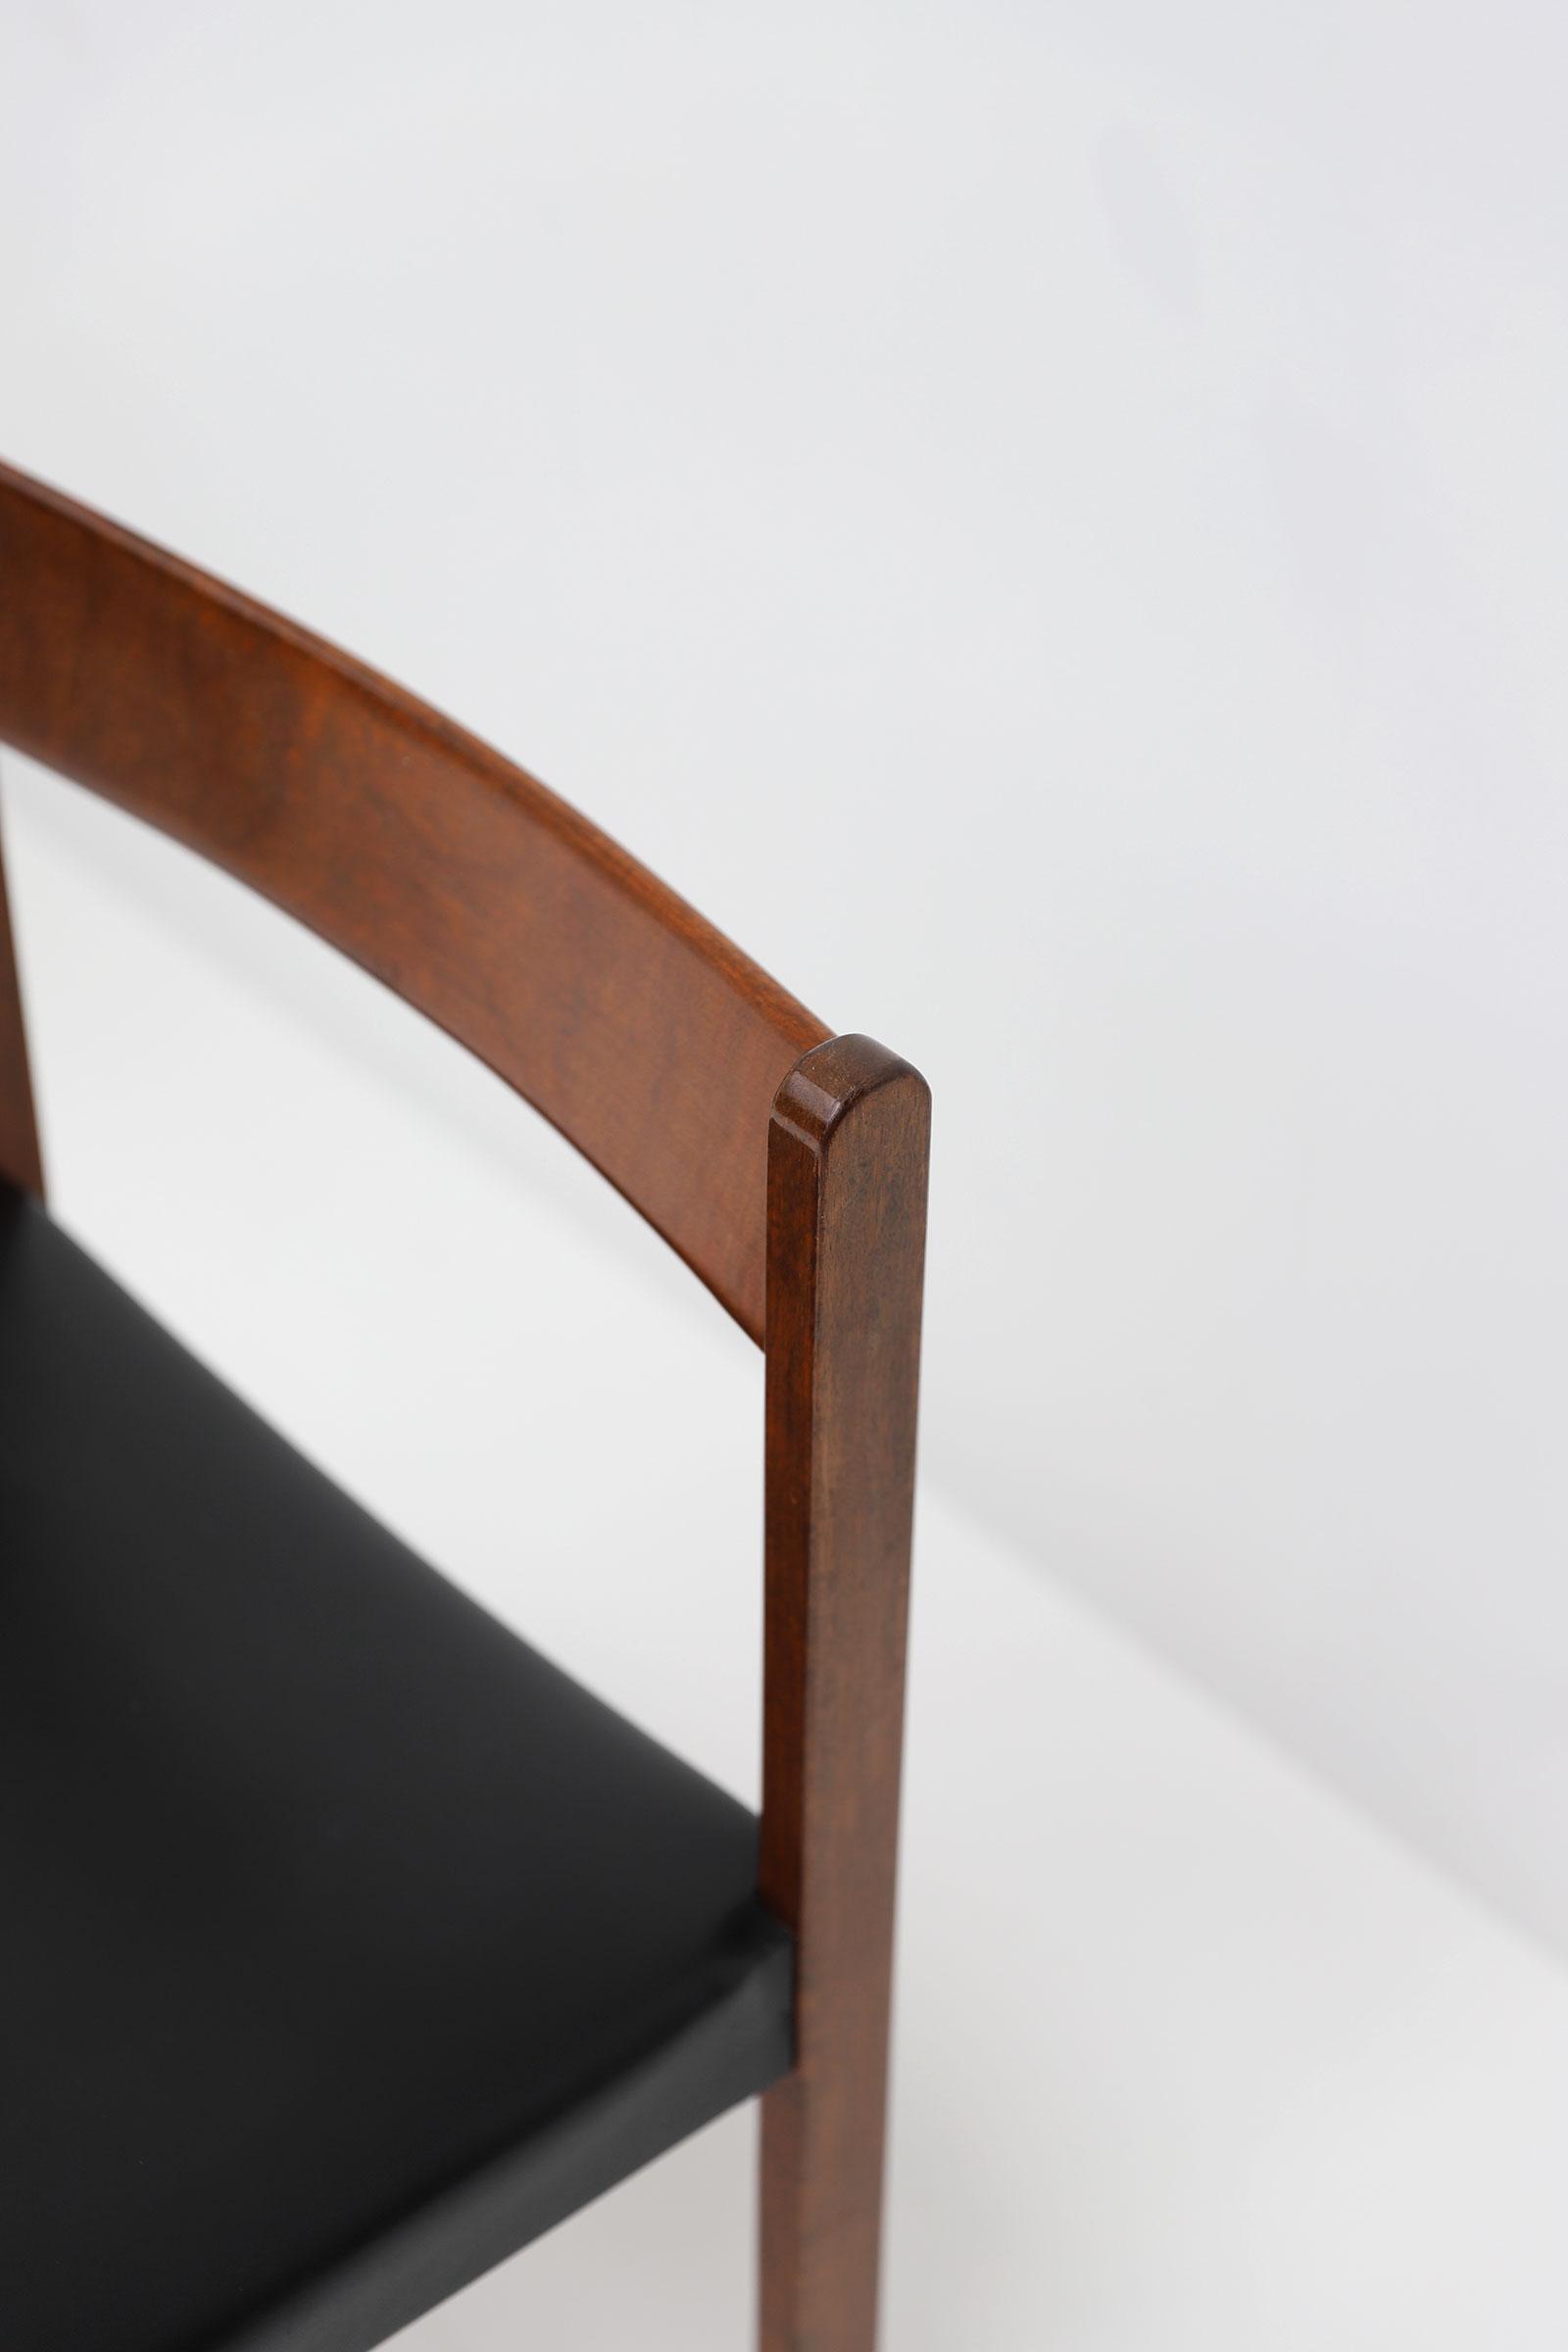 Alfred Hendrickx Belform Chairsimage 5